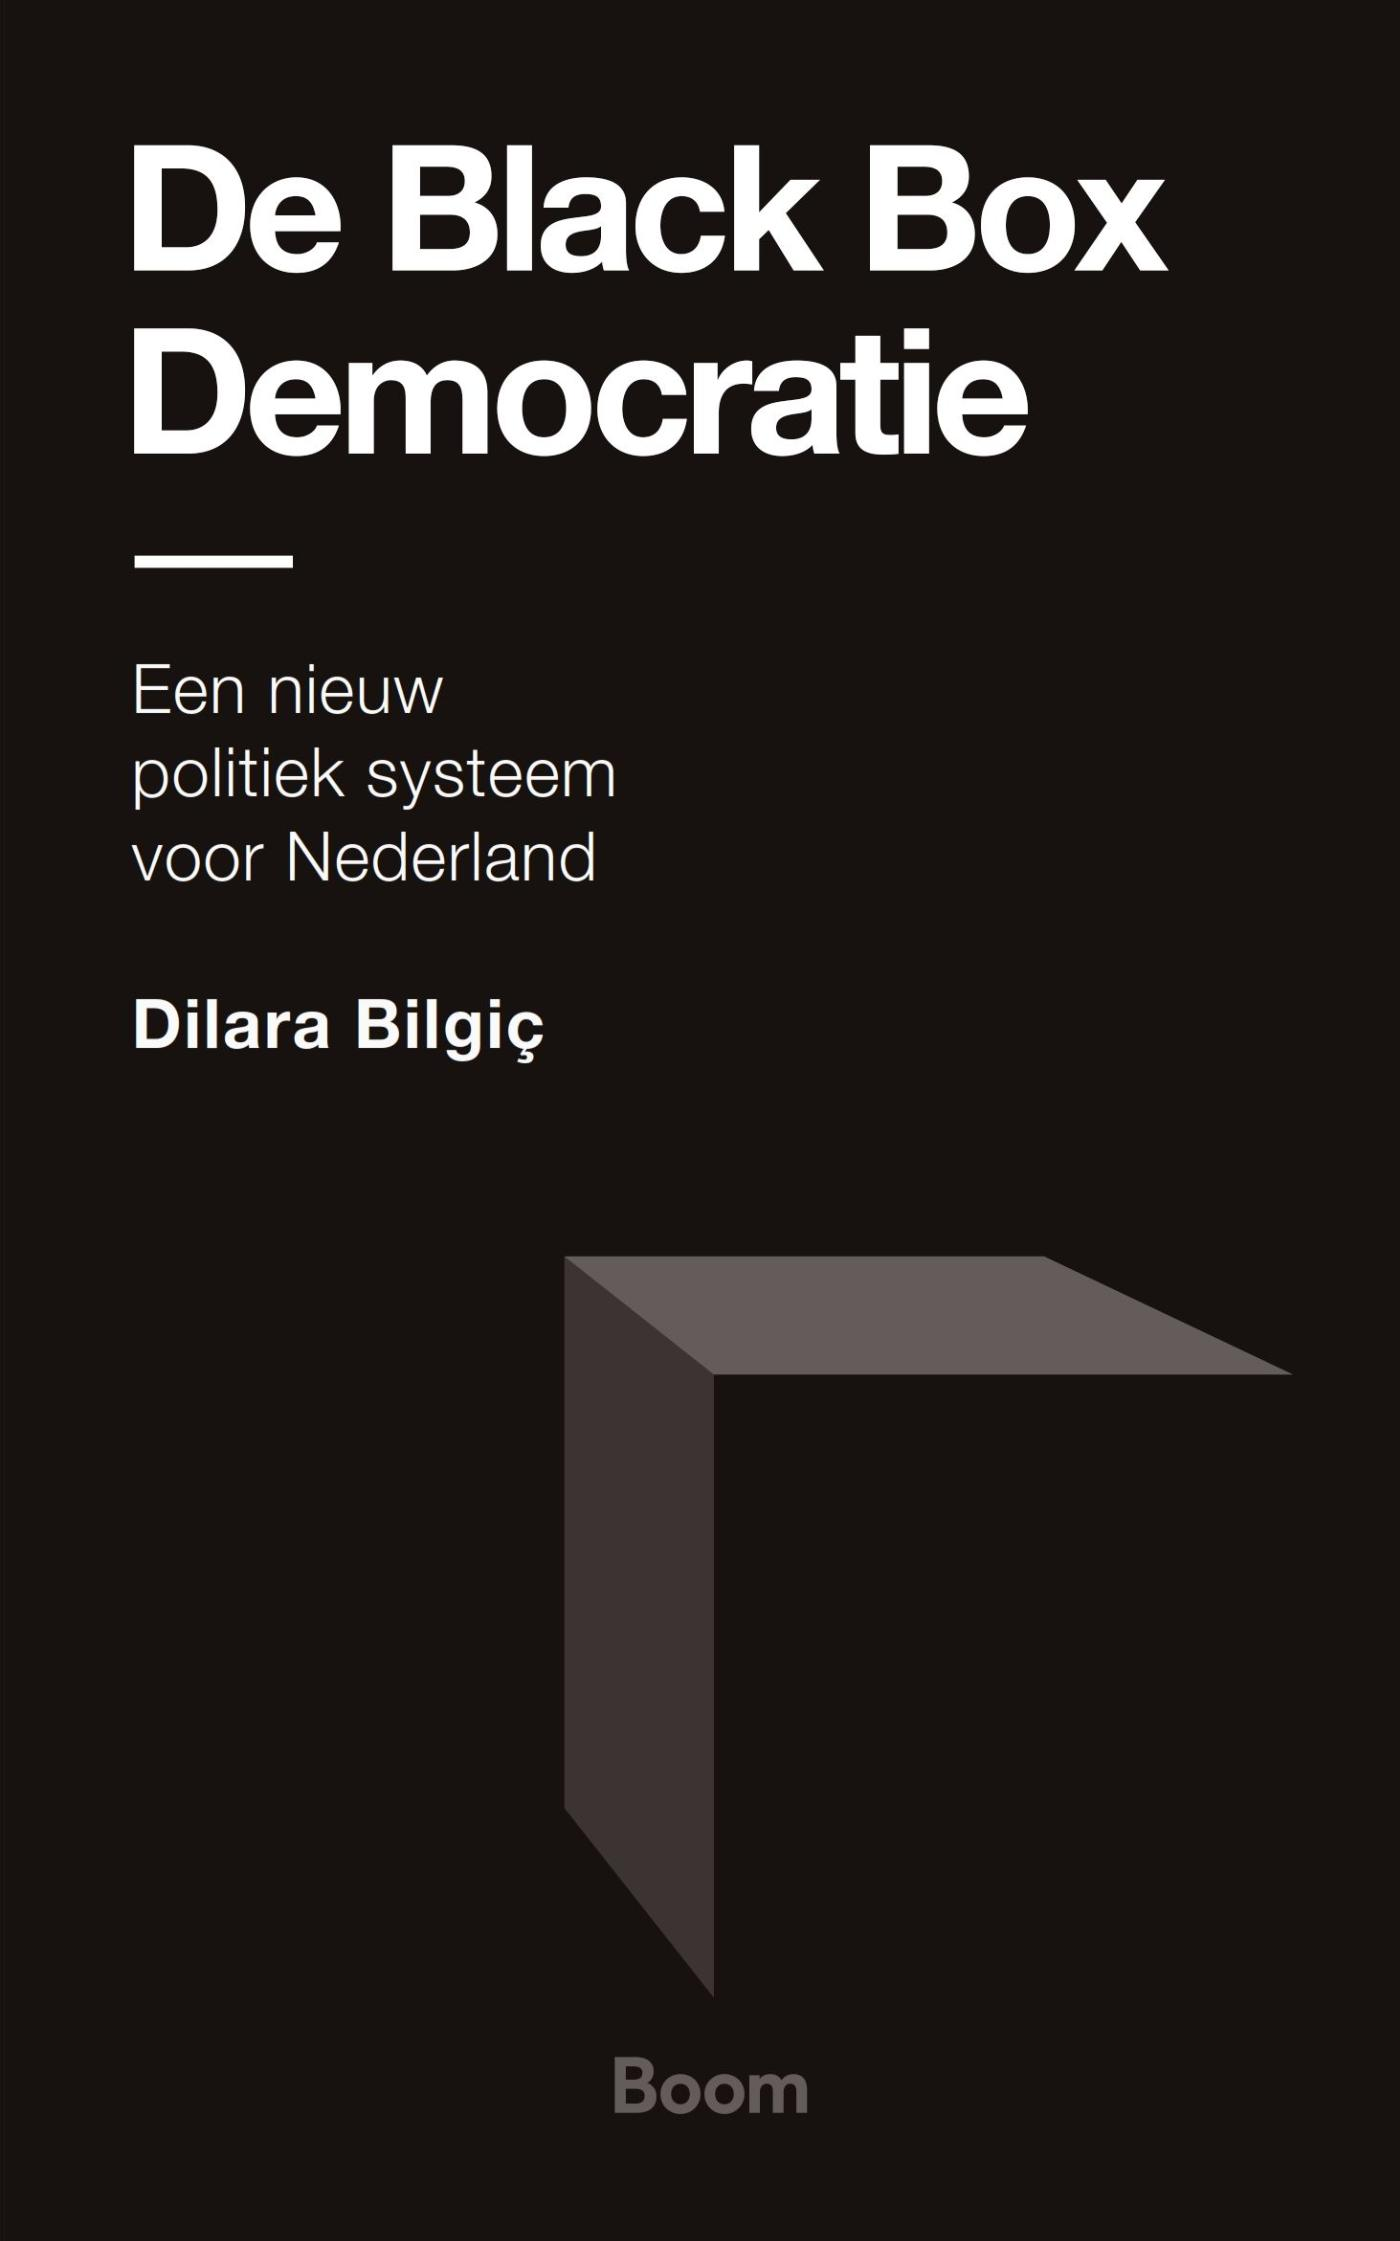 De Black Box Democratie